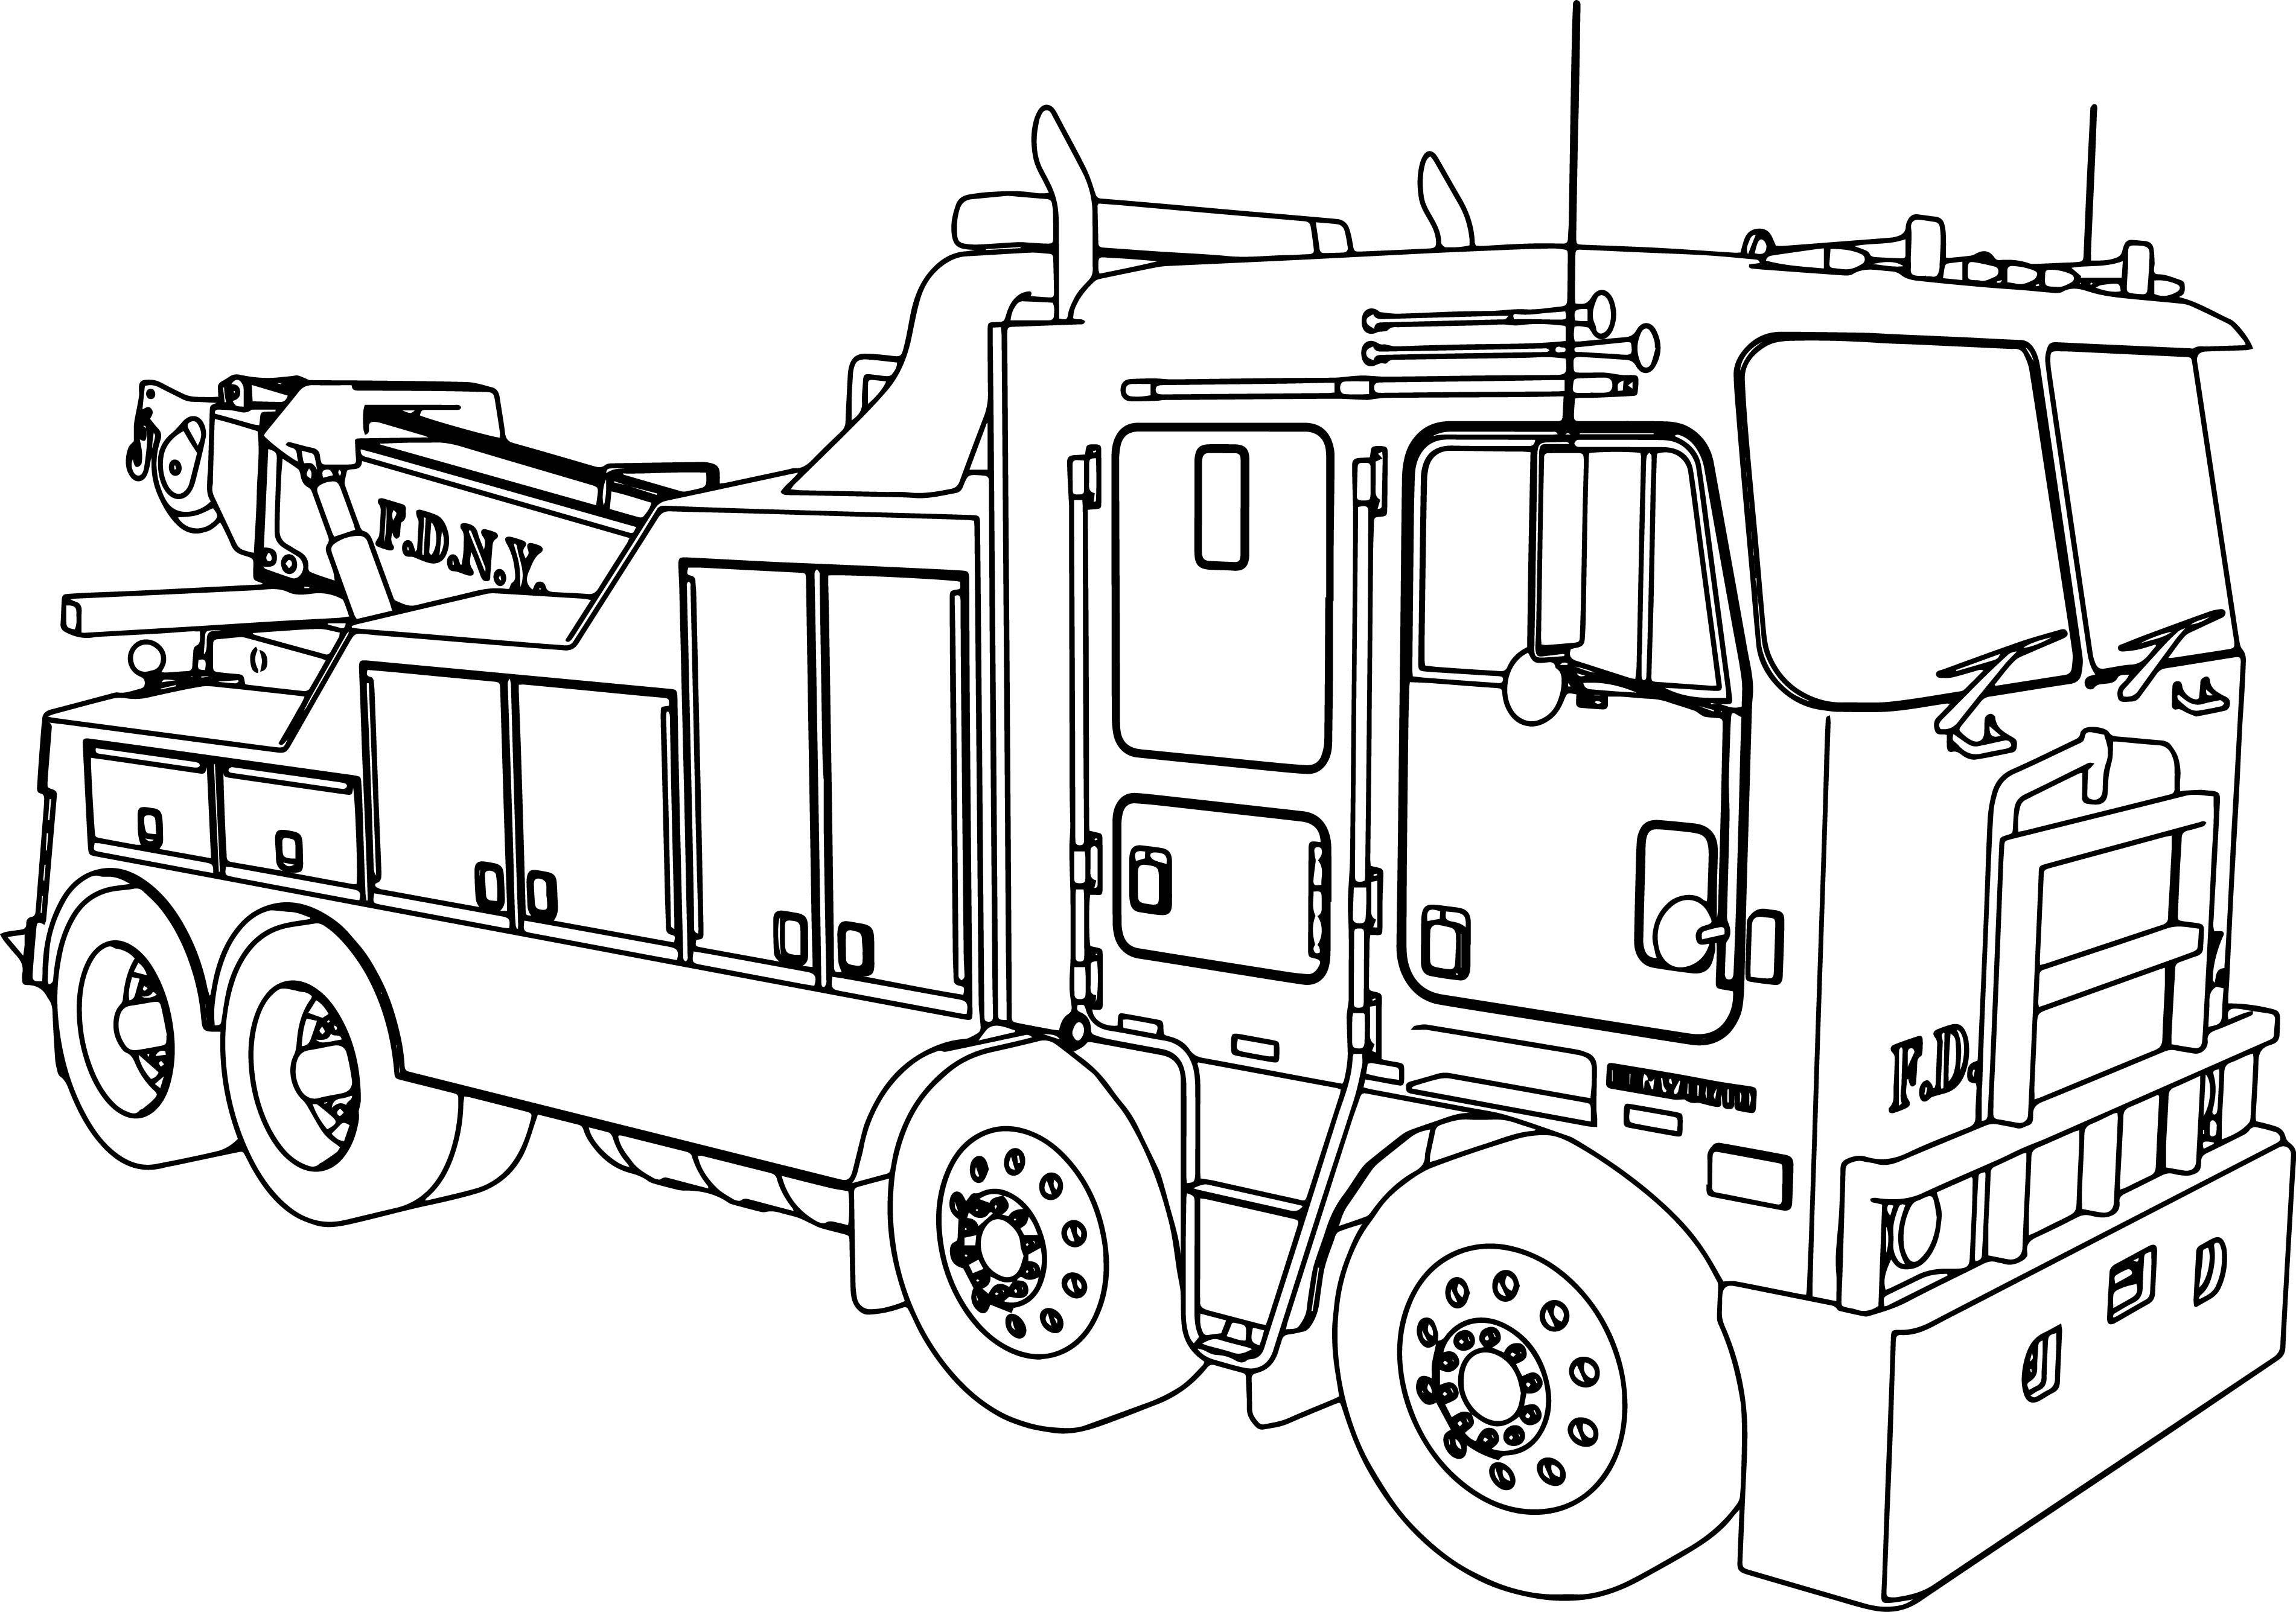 Kenworth Wrecker Fire Truck Coloring Page Kenworth Wrecker Fire